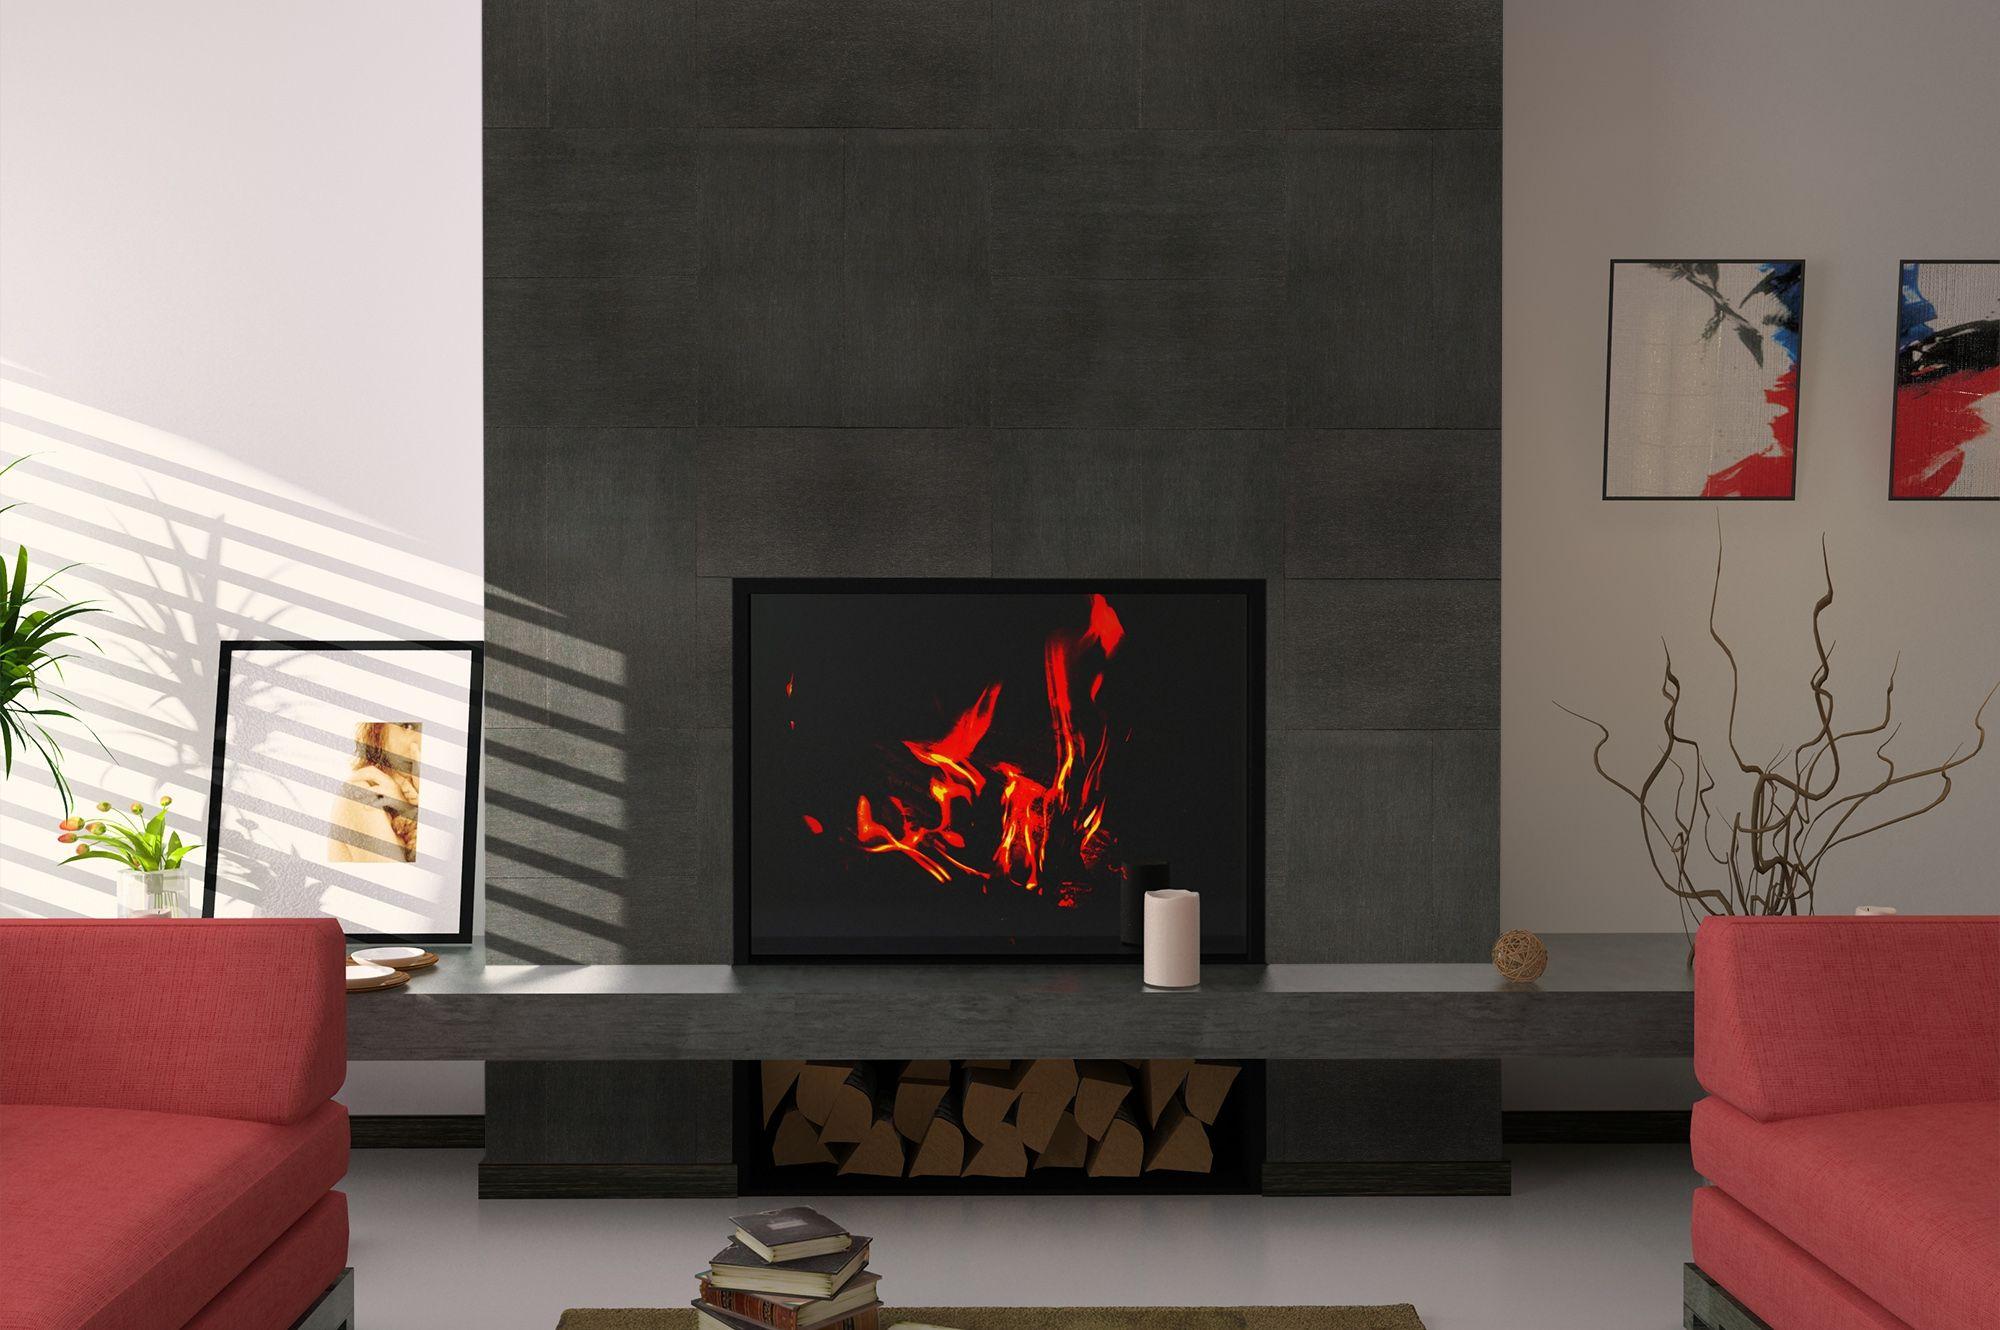 bed703f0b4d9cb22a567bbc65d1826fc Top Result 50 Lovely Bronze Fireplace Screen Image 2018 Ldkt